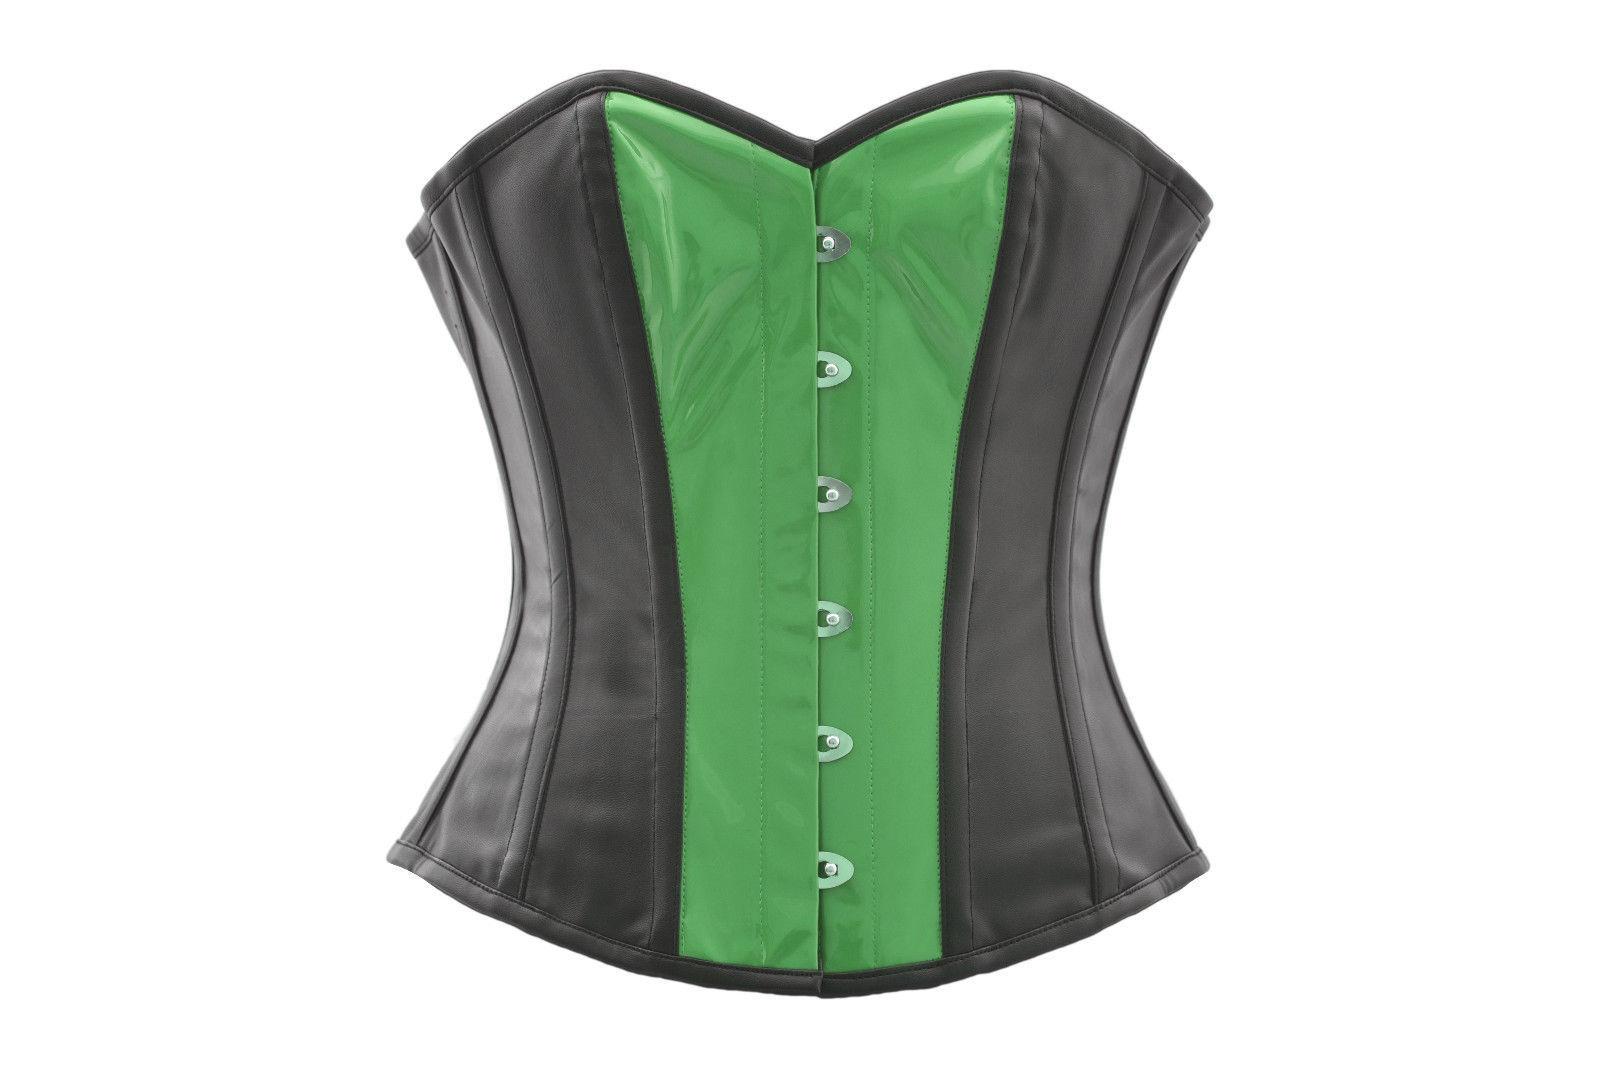 Black Leather & Green PVC Steampunk Bustier Waist Training Overbust Corset Top